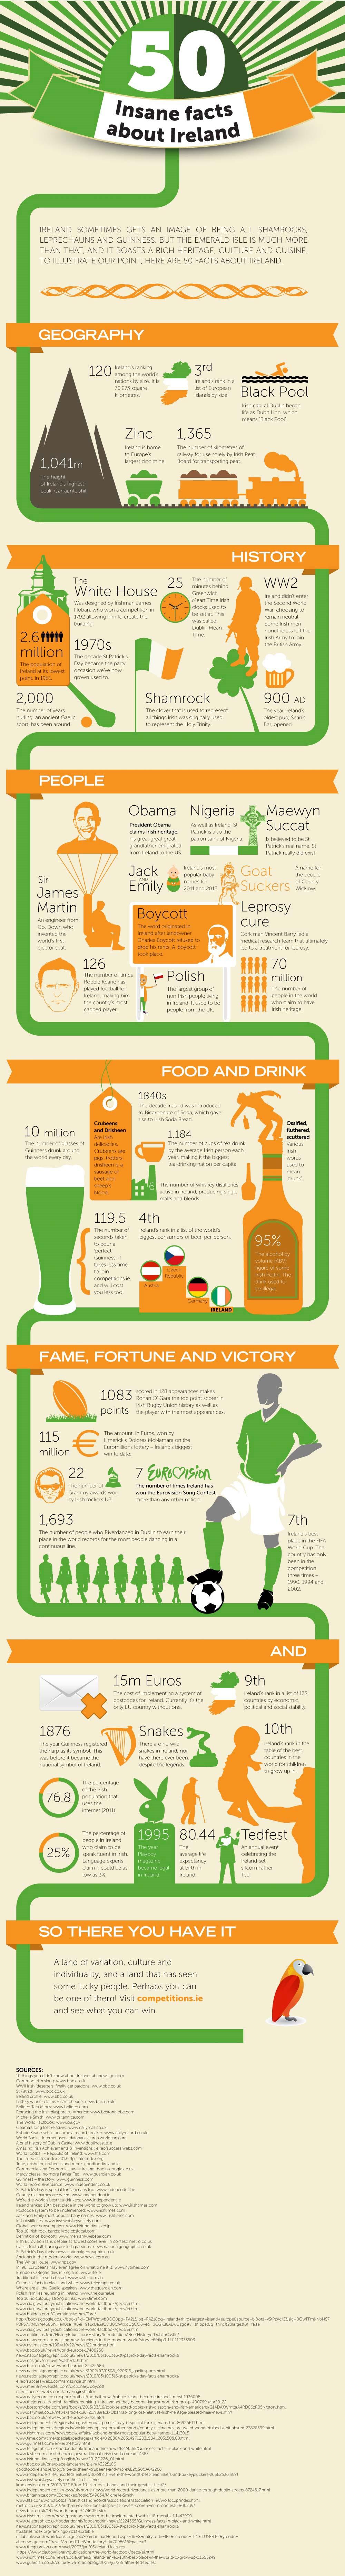 Ireland Confidentiald-Infographic